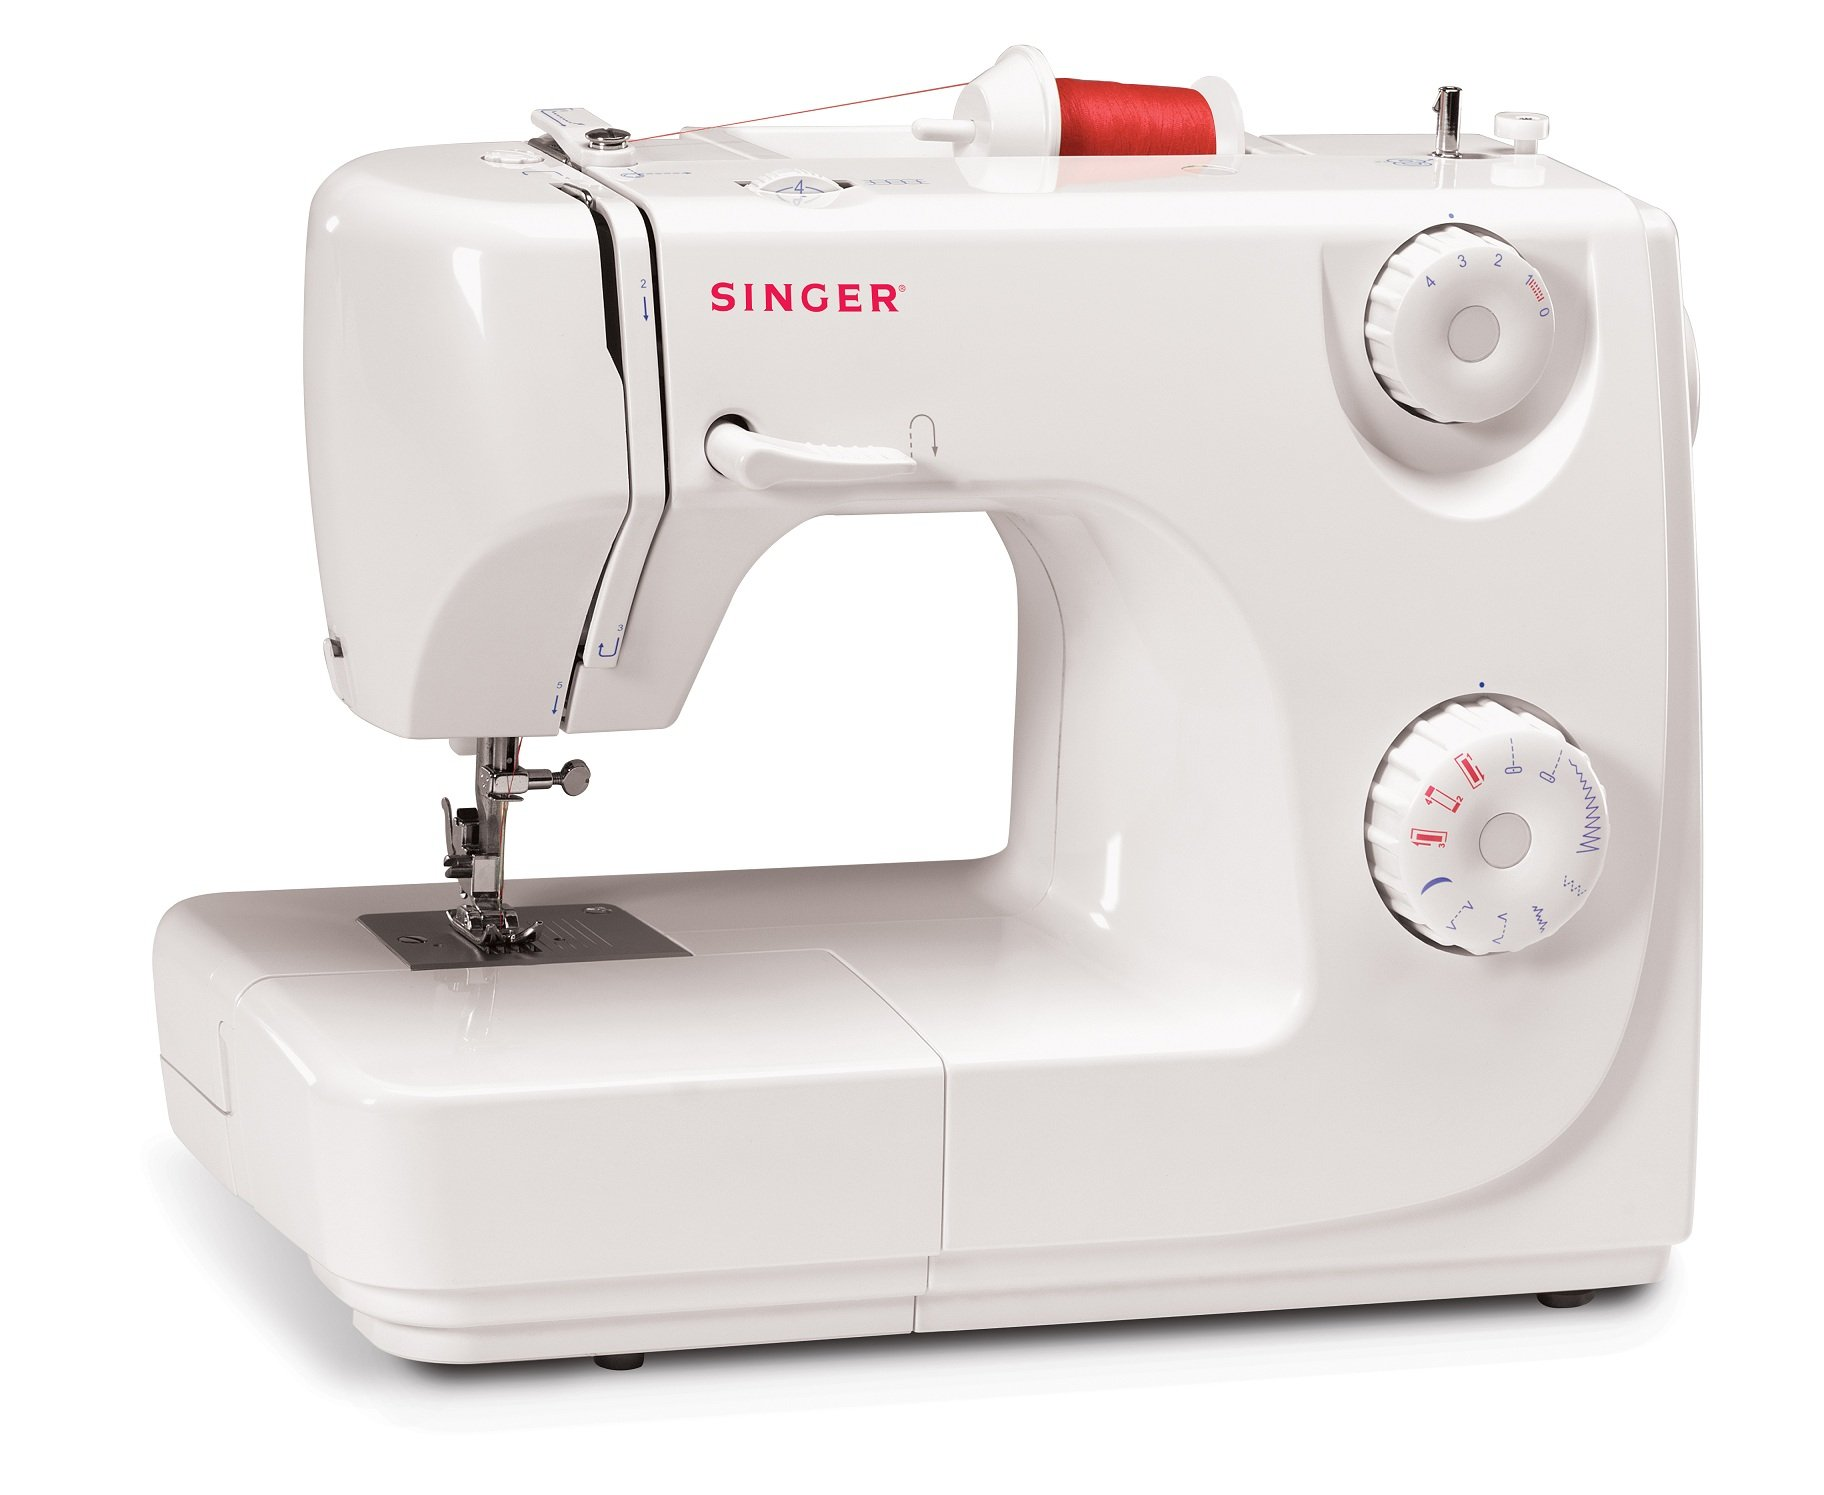 Singer 8280 - Máquina de coser automática, 8 puntadas, color blanco product image